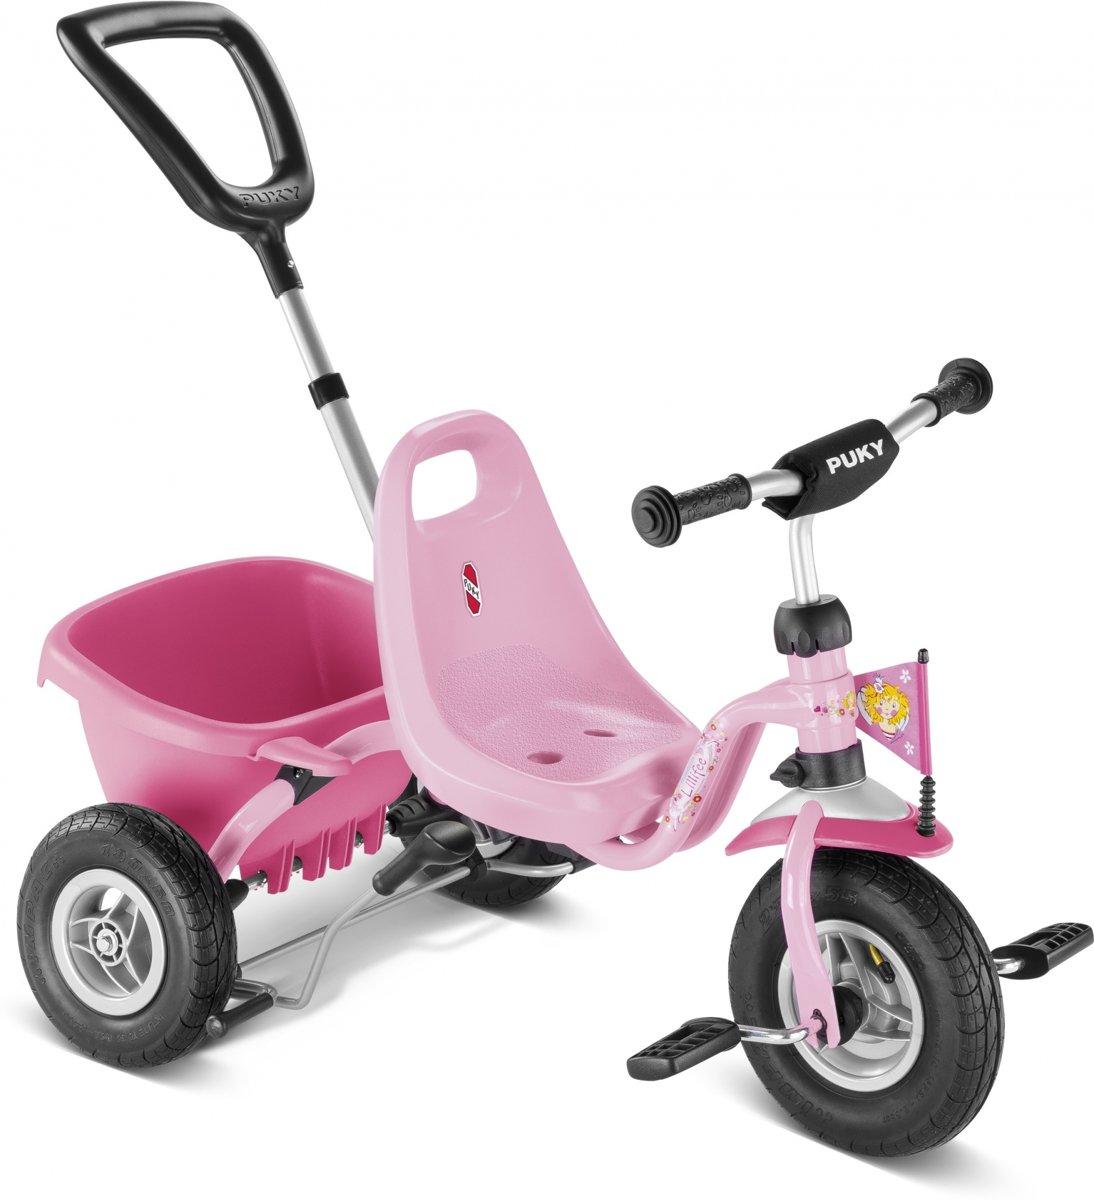 Puky CAT 1 S Roze Lillifee - Driewieler